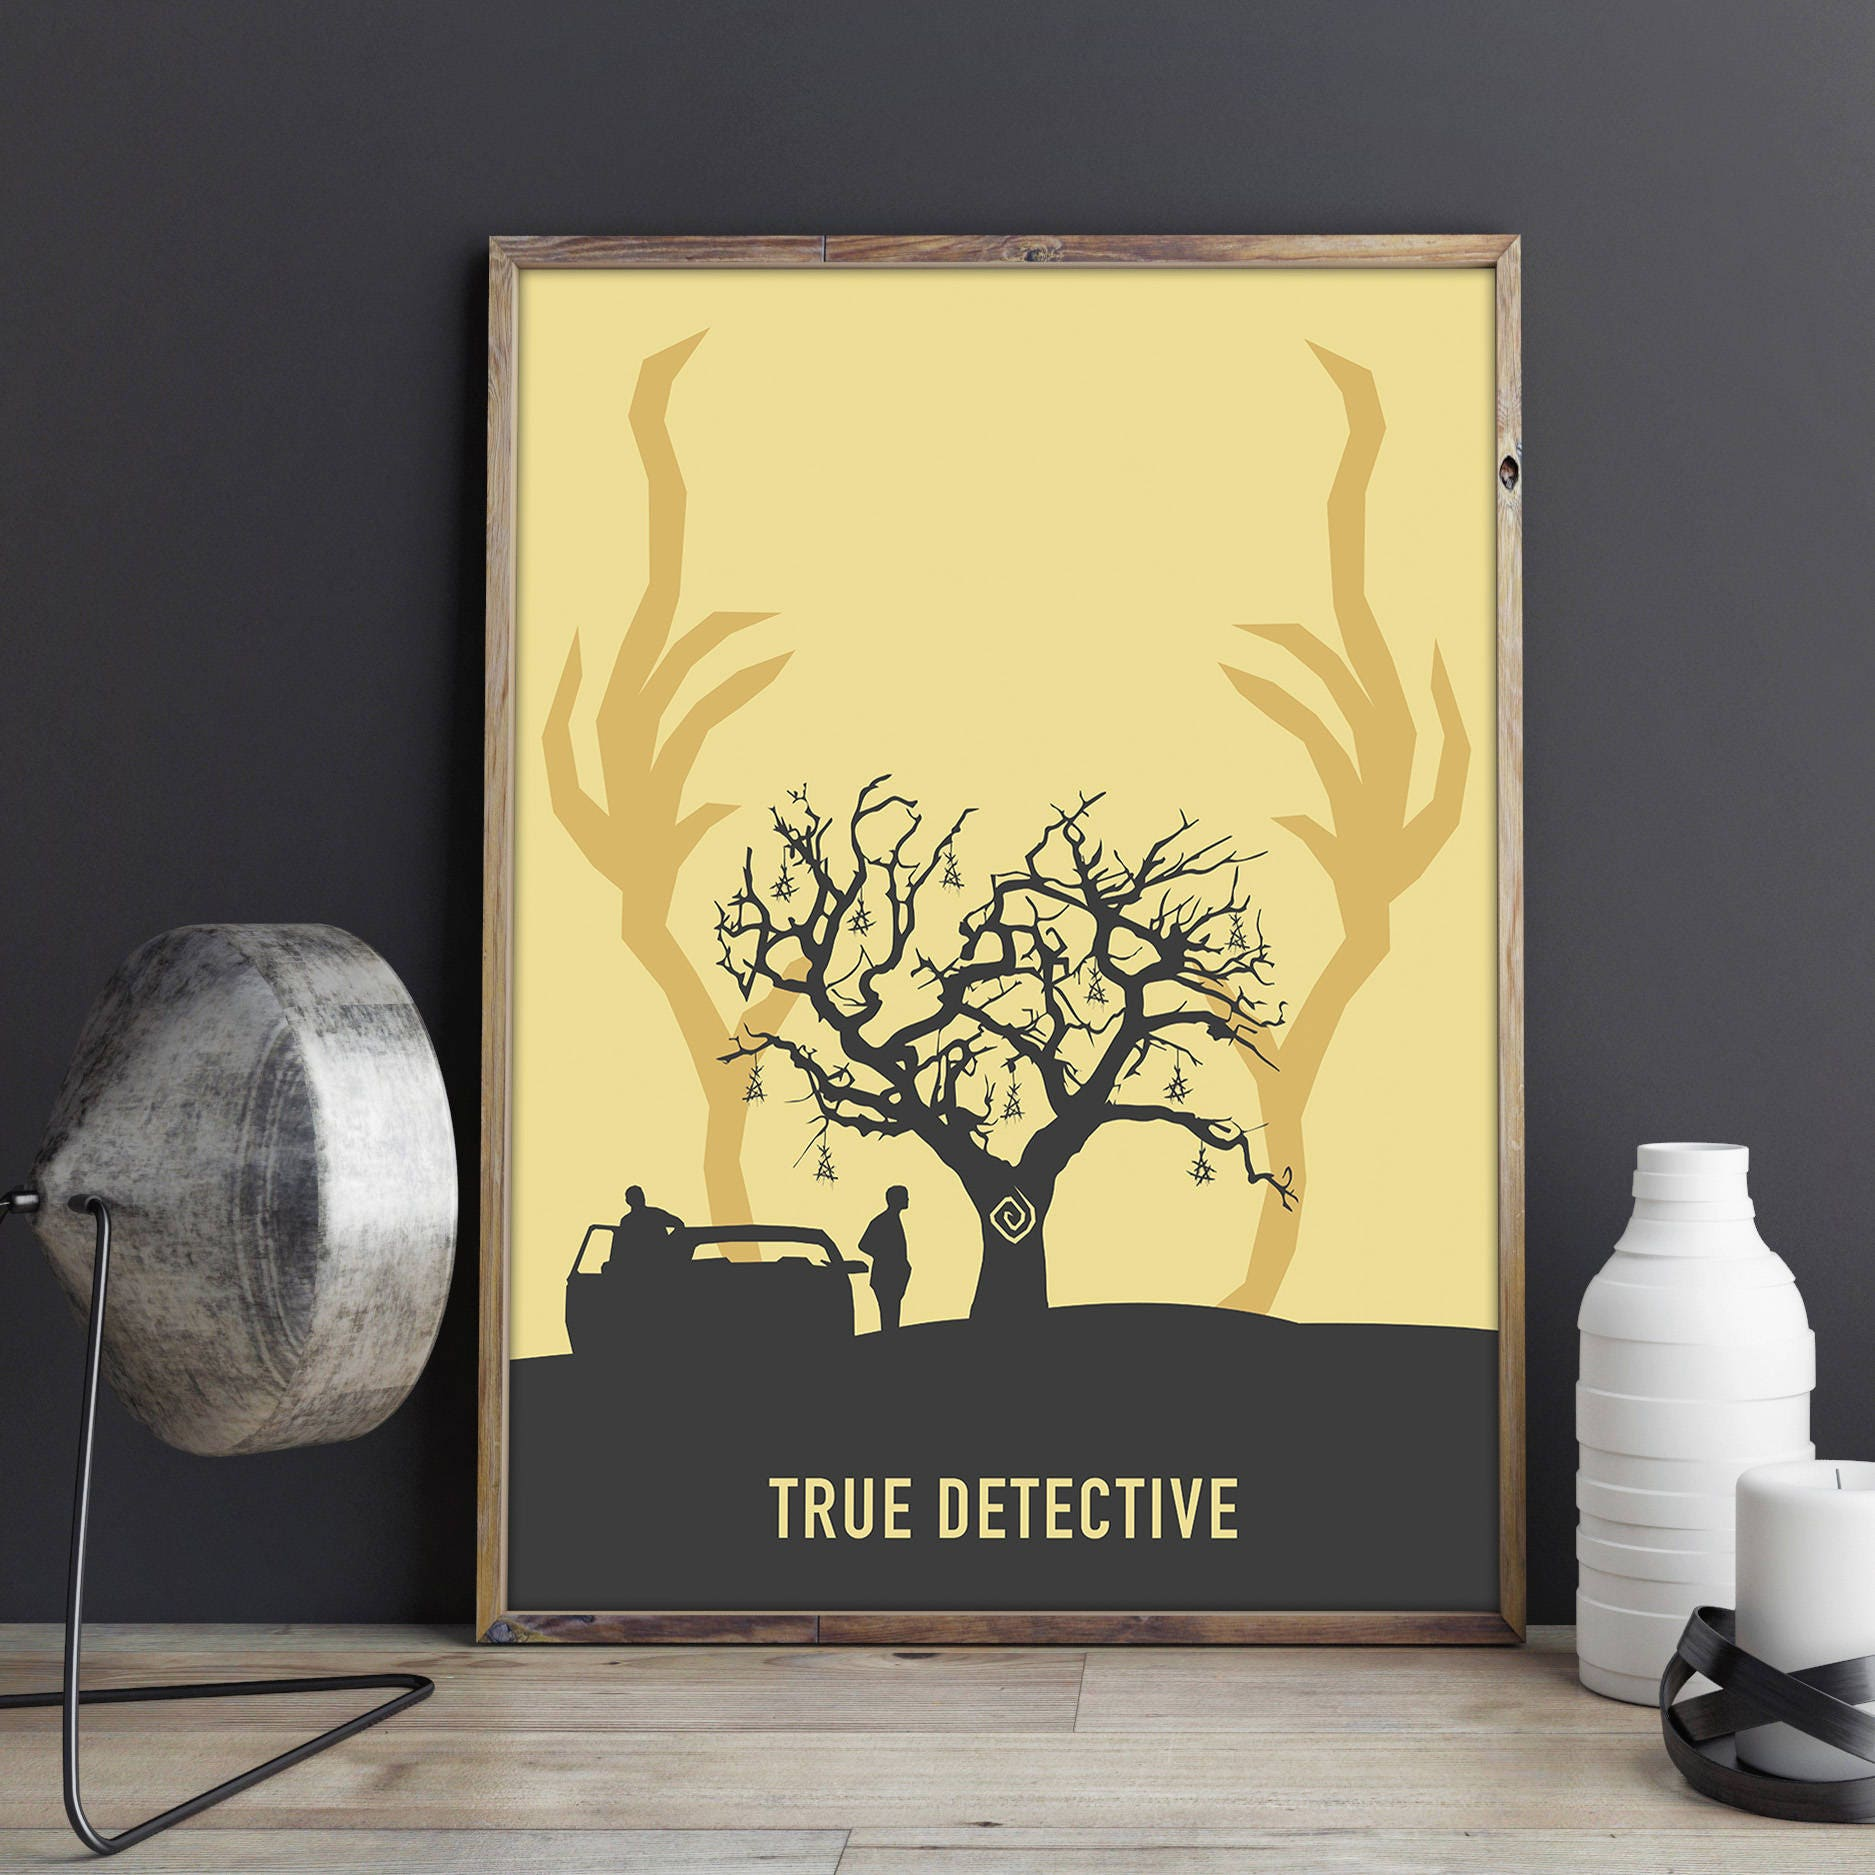 True Detective Poster Minimalist Tv Show Wall Decor True